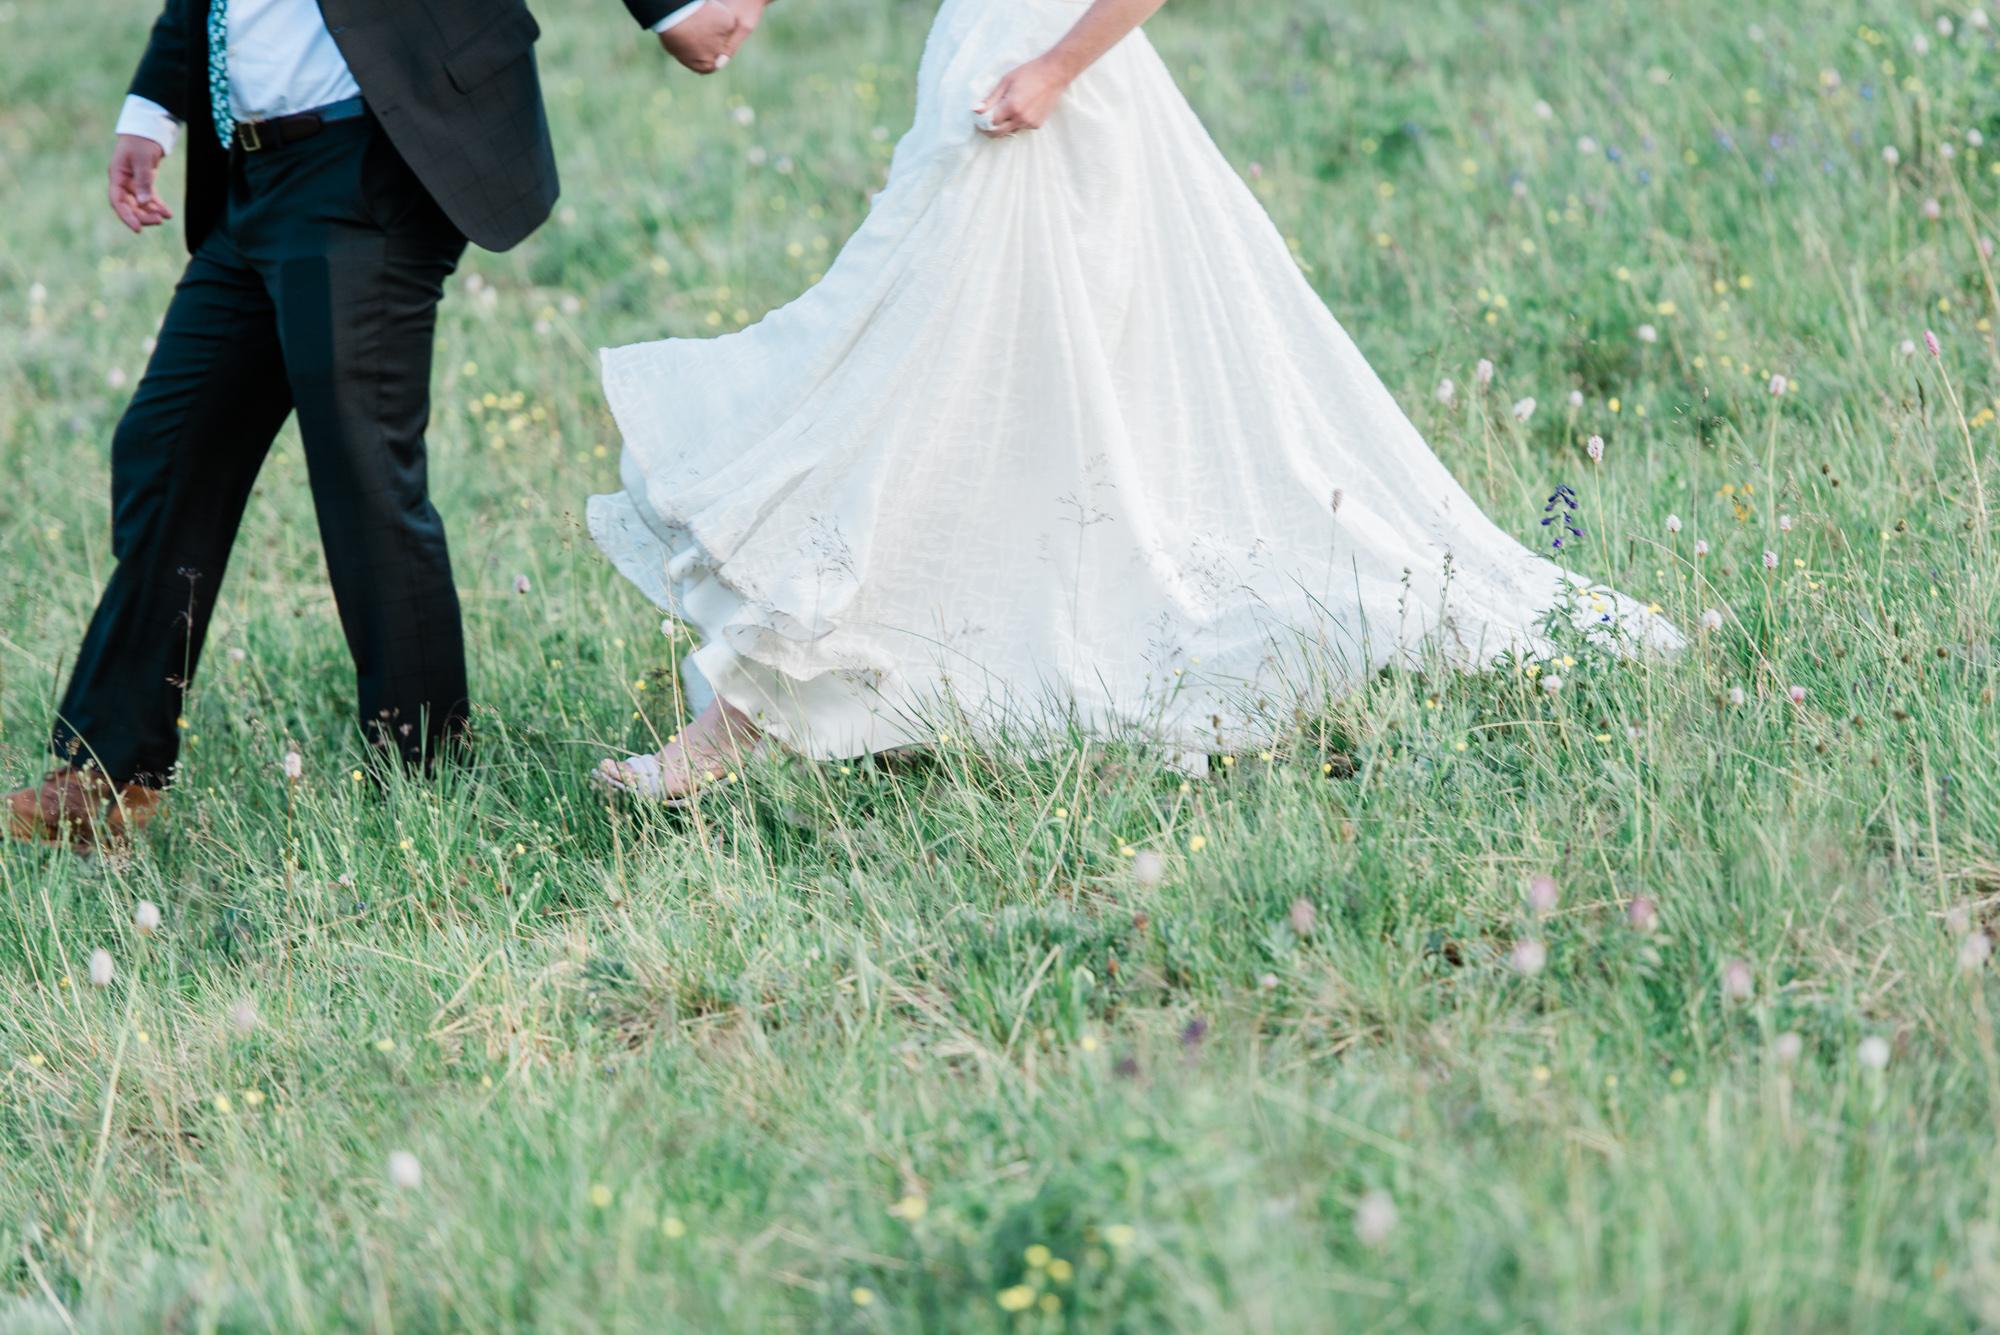 2019-08-09-Wedding-Kate-Hunter-ArapahoeBasin-3518.jpg